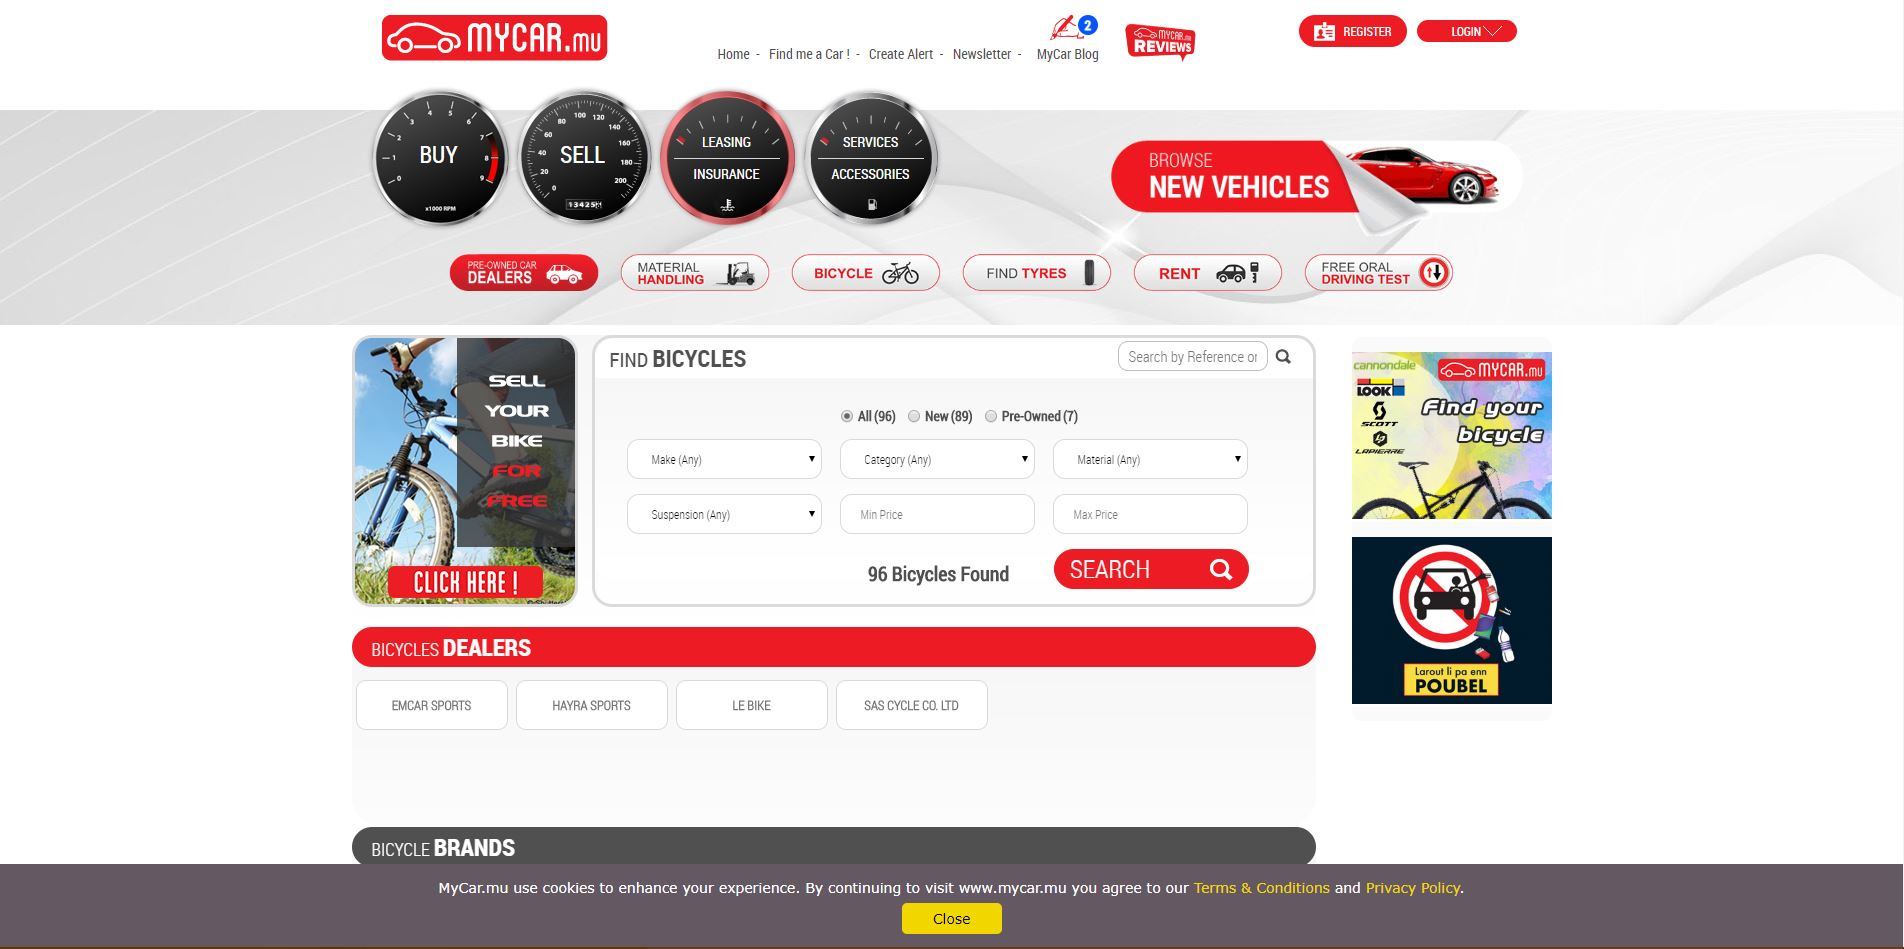 mycar-mu-digital-marketing-mauritius-e-commerce